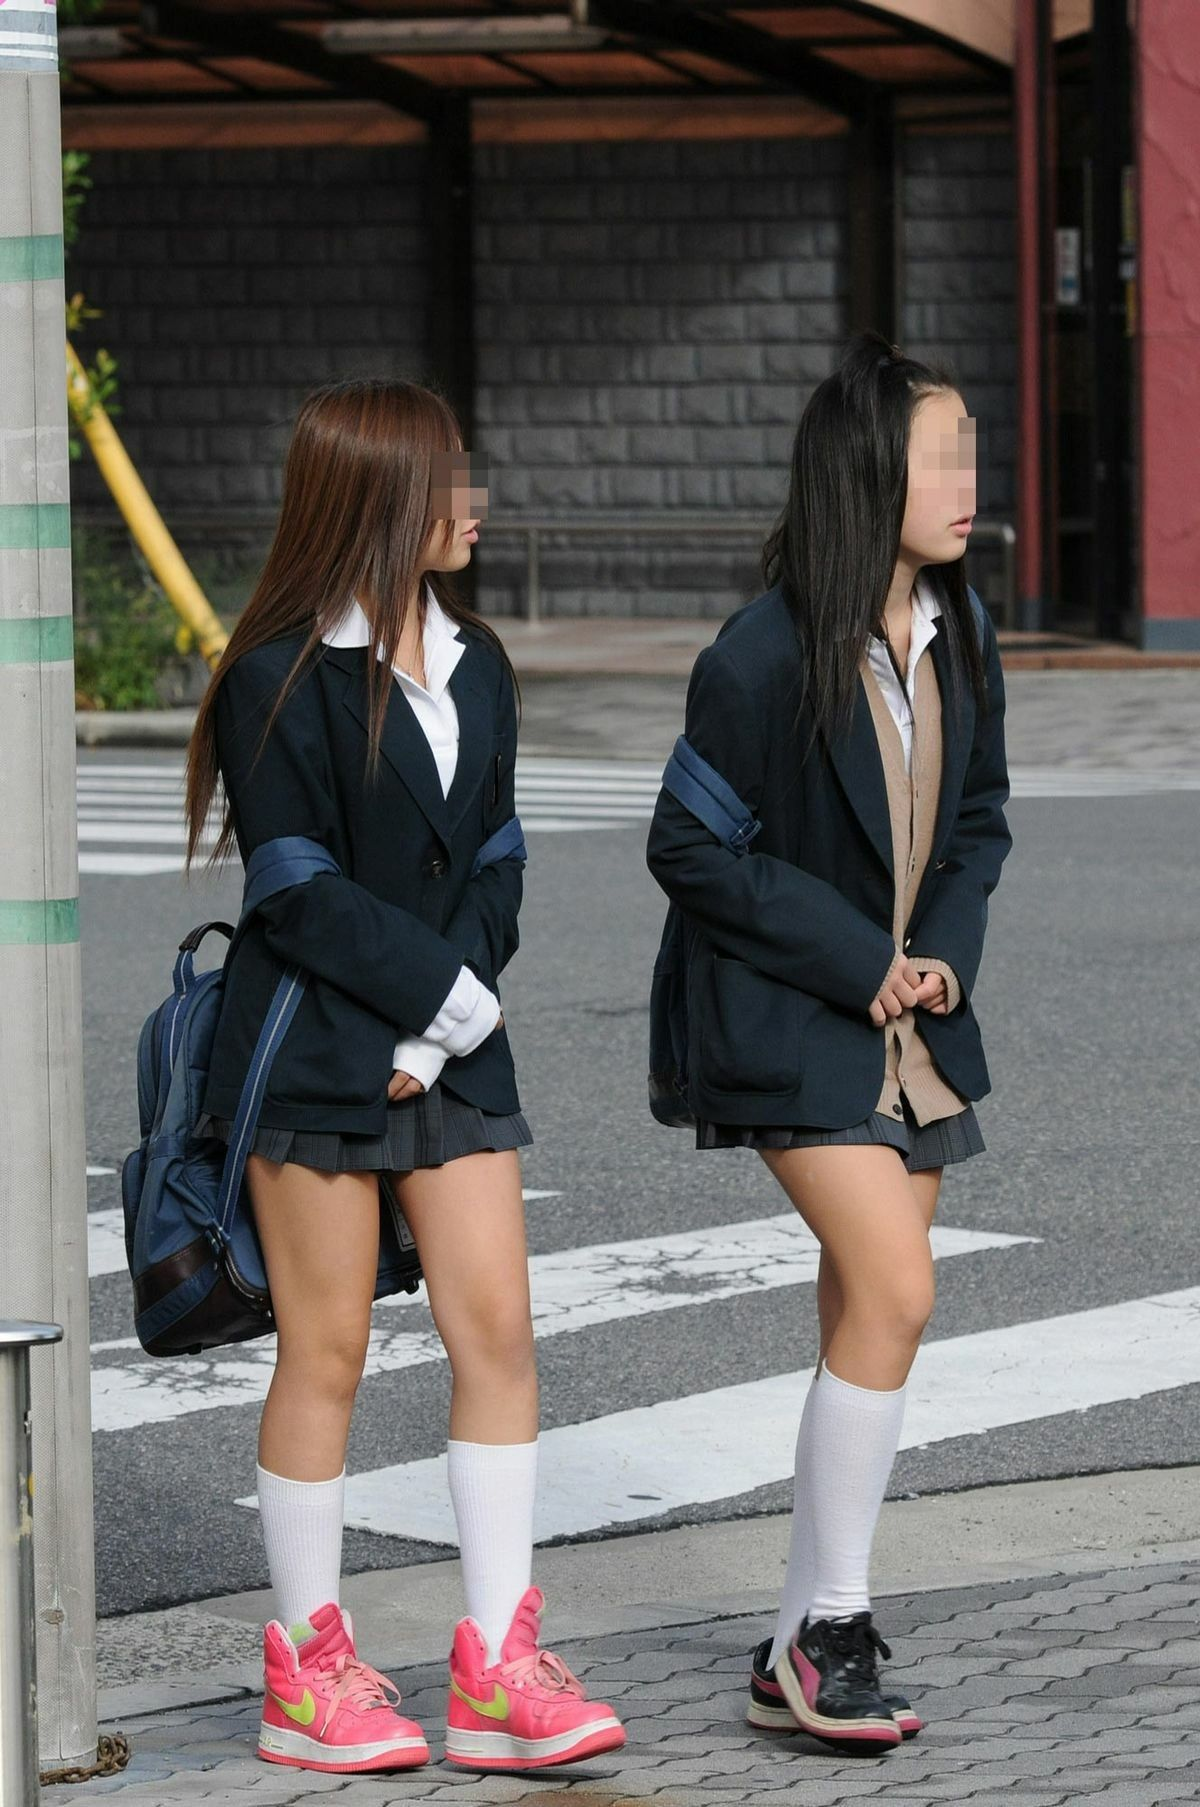 koedkariuchi セーラー服緊縛  40 girls